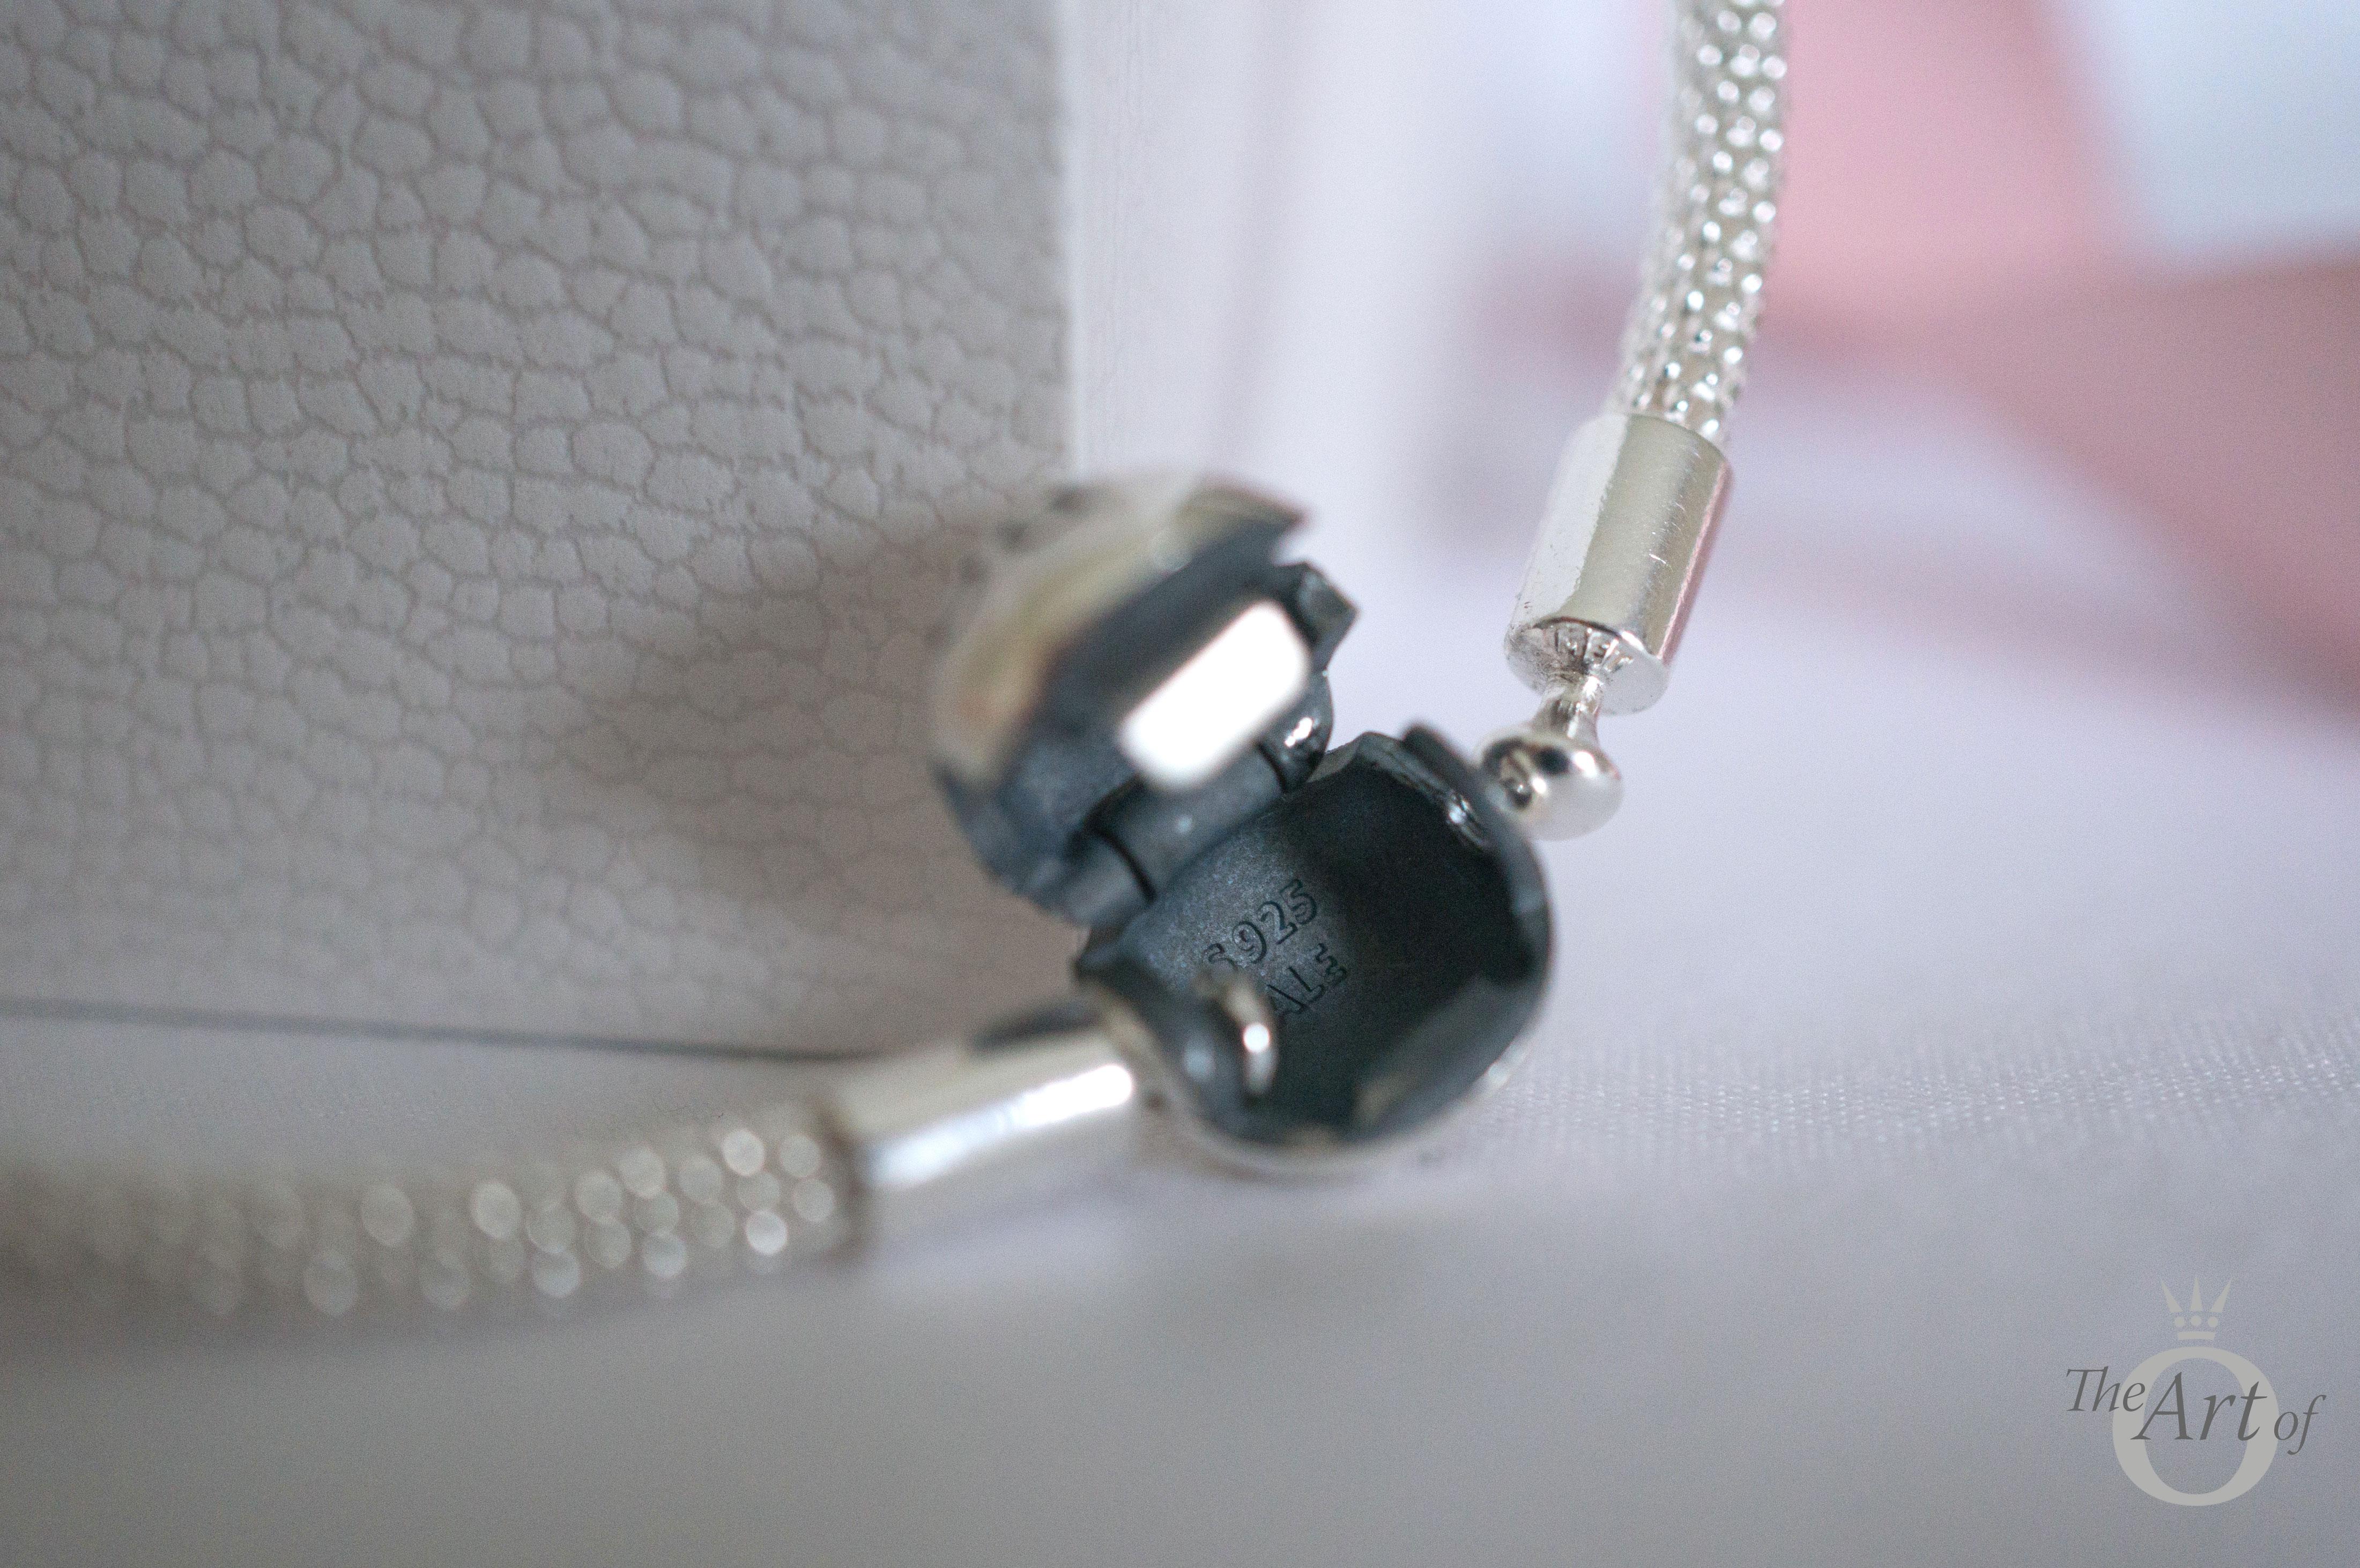 4d6f64305 596543-Pandora-Moments-Mesh-Bracelet-3-l - The Art of Pandora | More ...